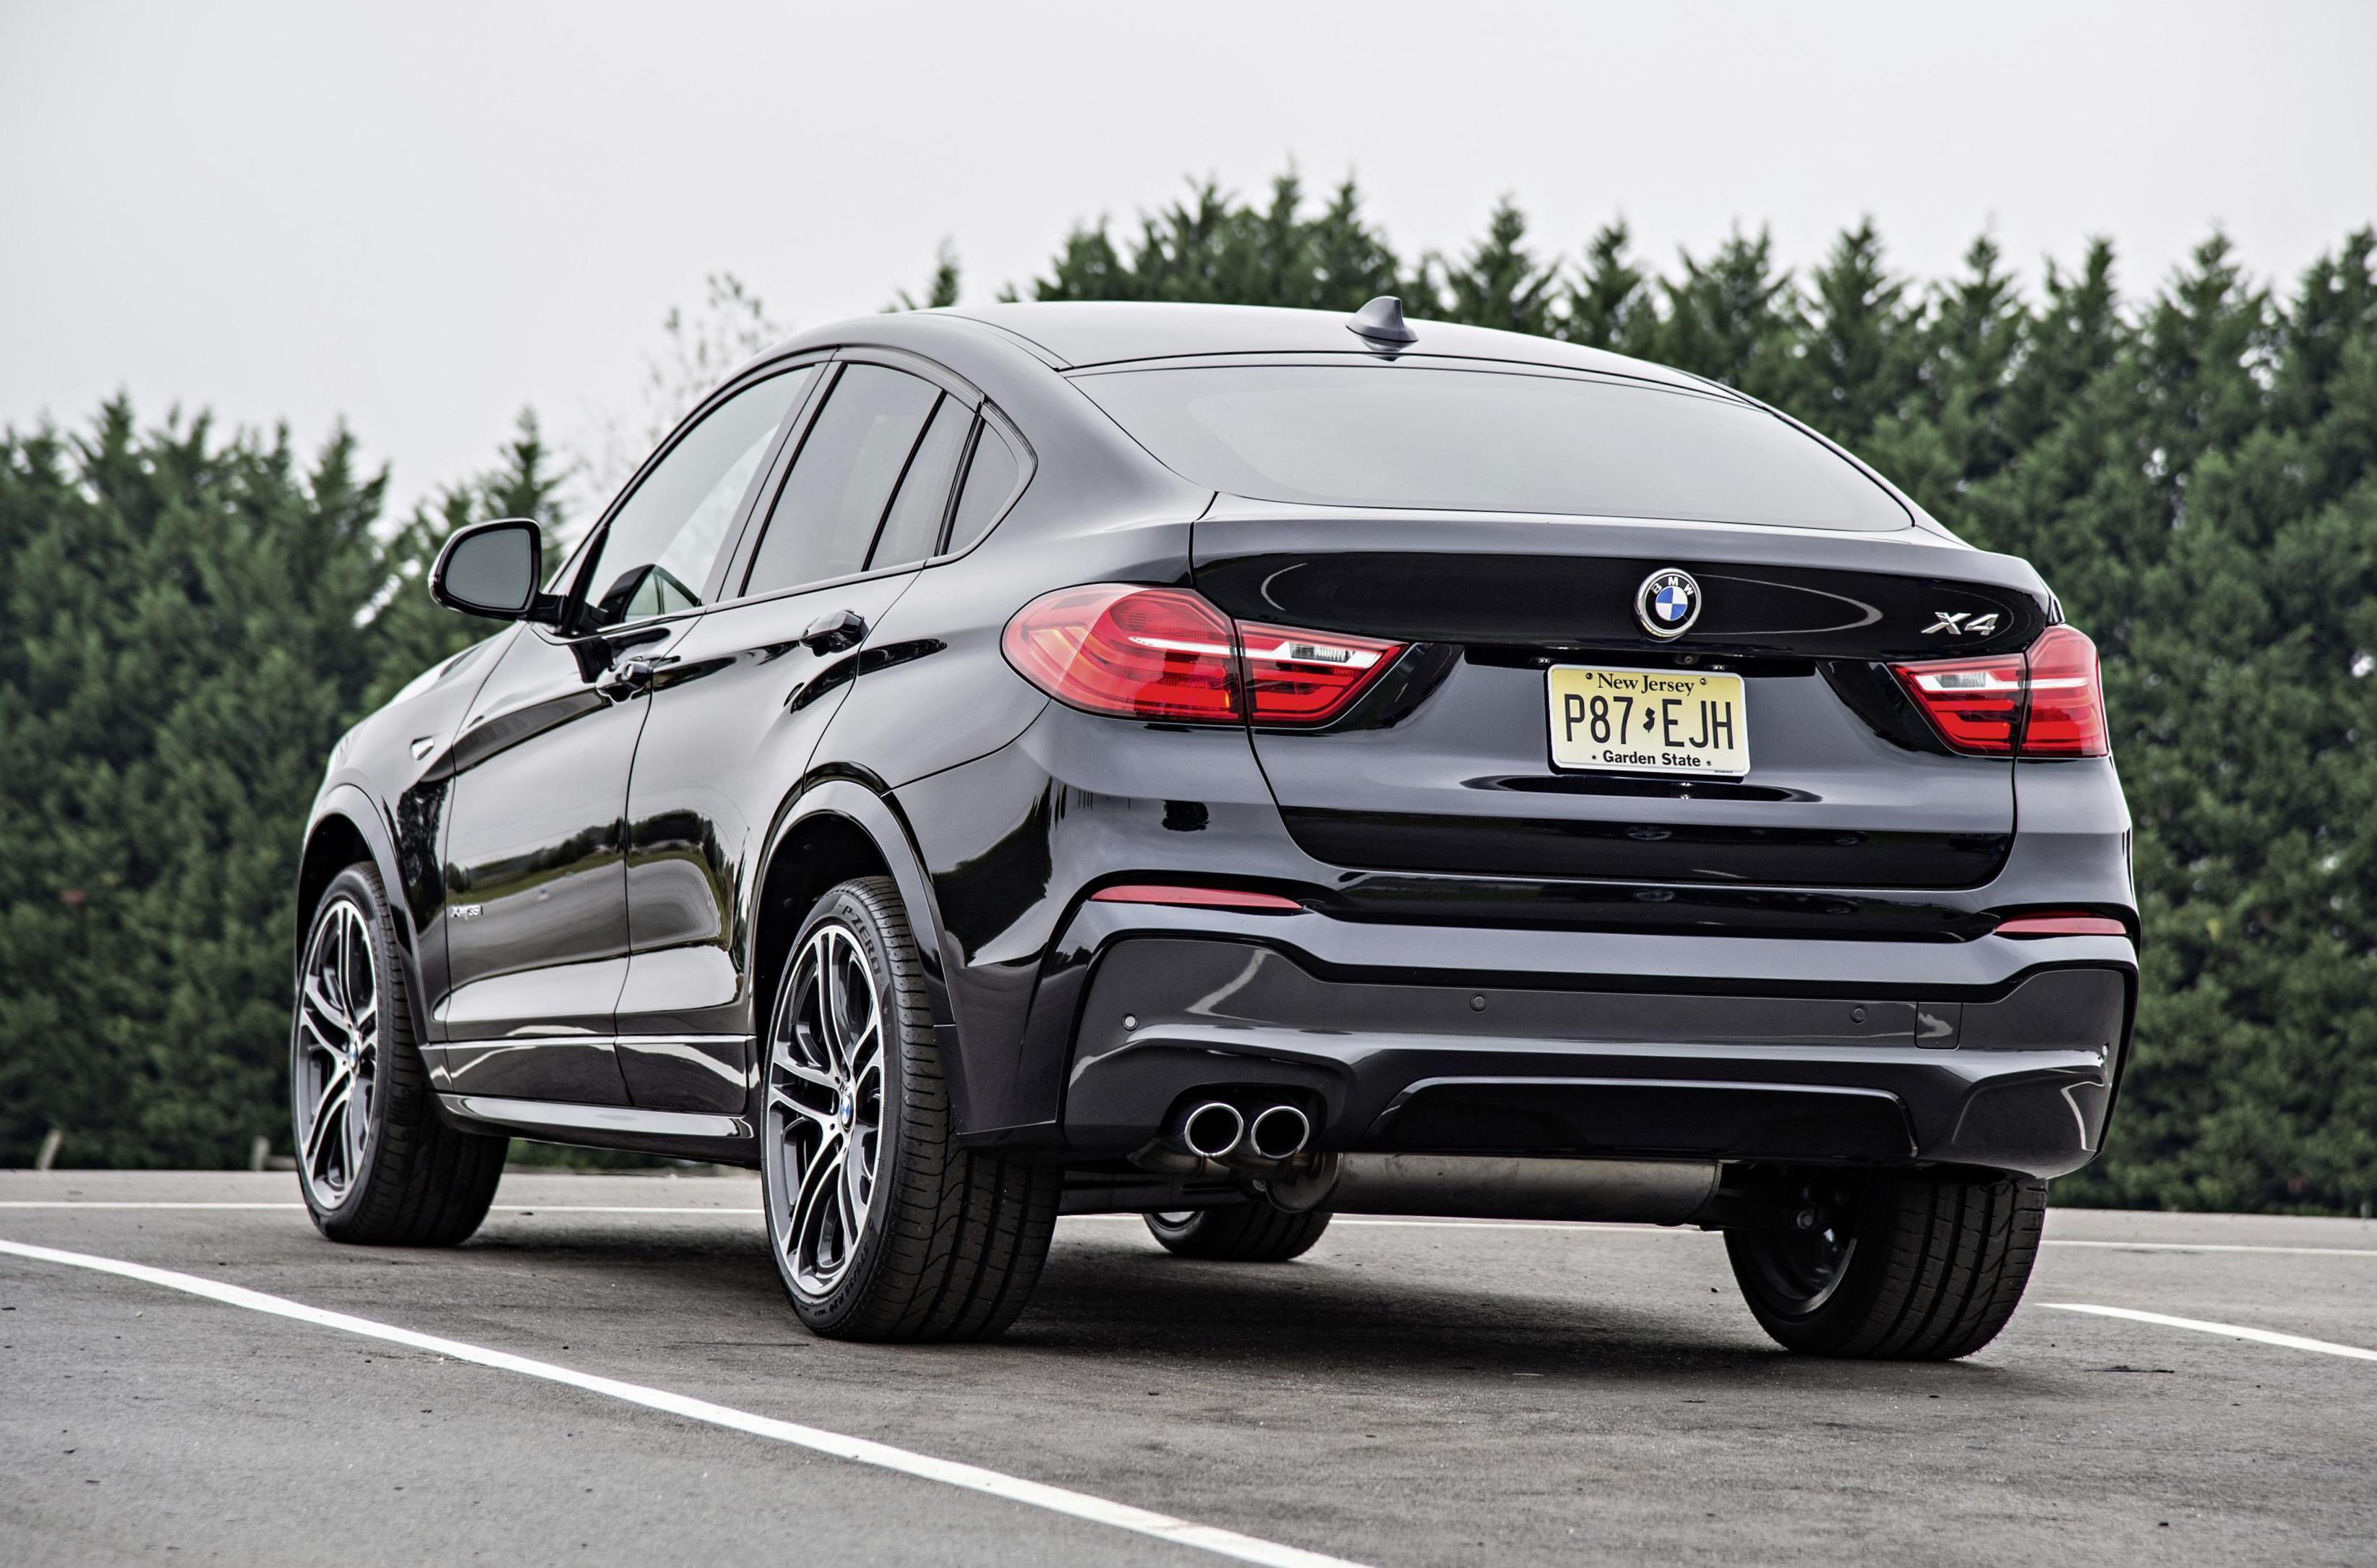 2017 BMW X4 M40i: Download Free HD Wallpapers [Mobile + Desktop] Pixeles